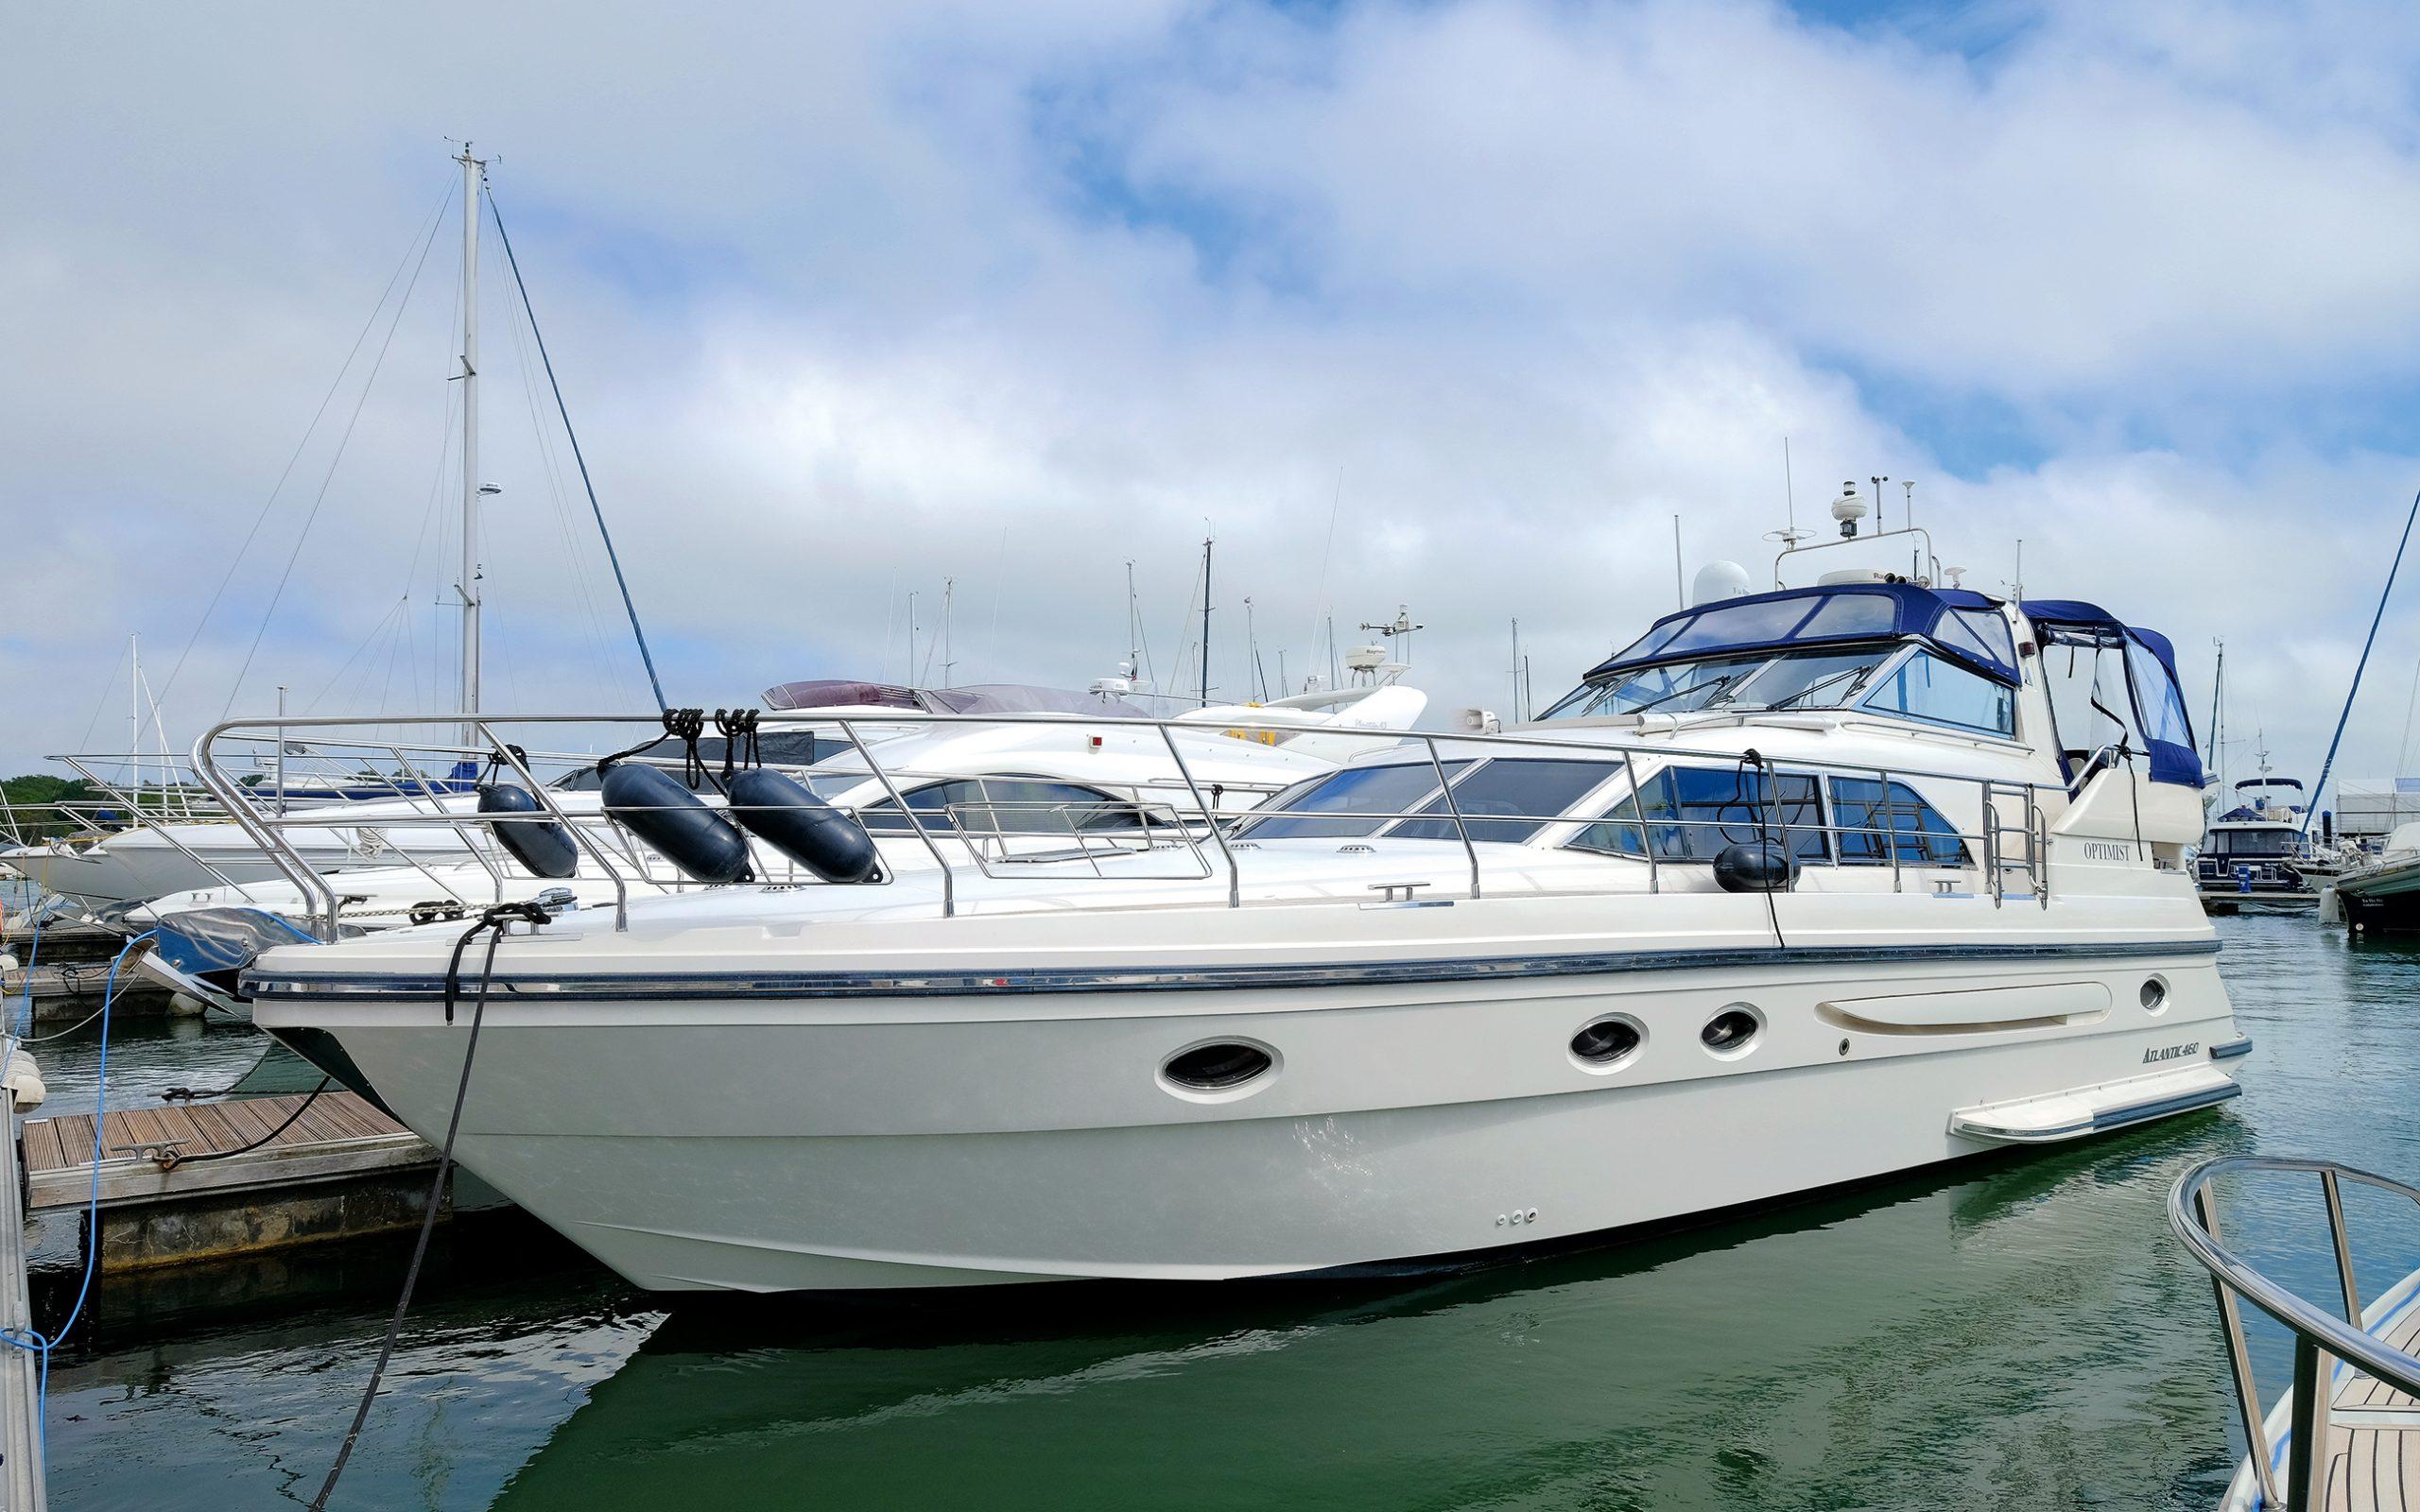 atlantic-460-used-boat-video